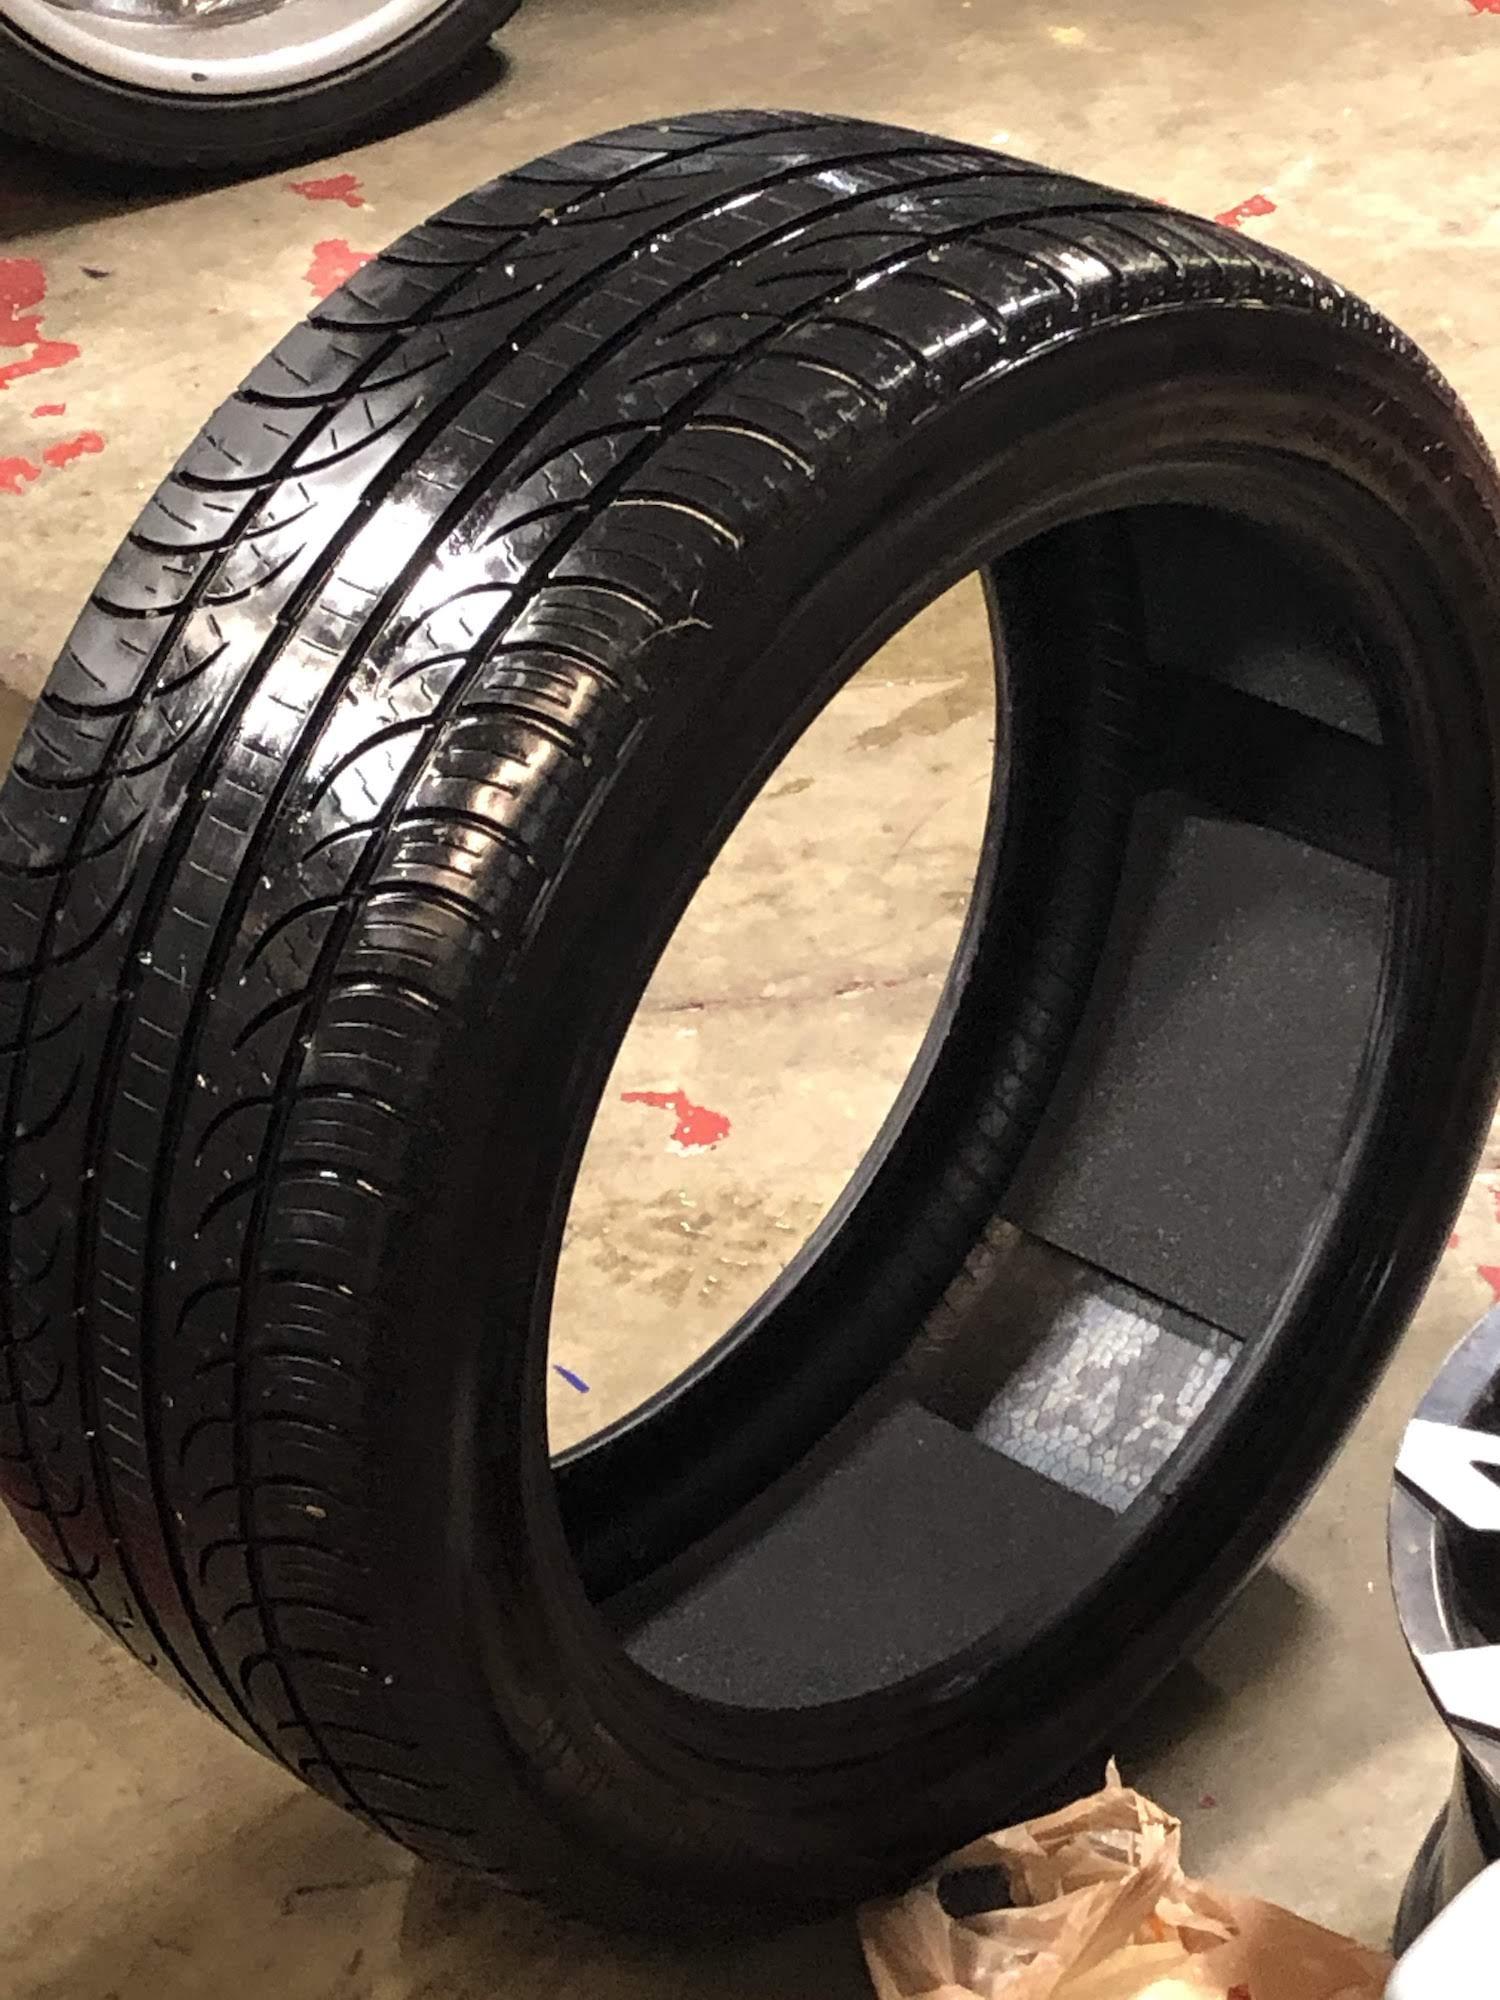 foam blocks in tires closeup